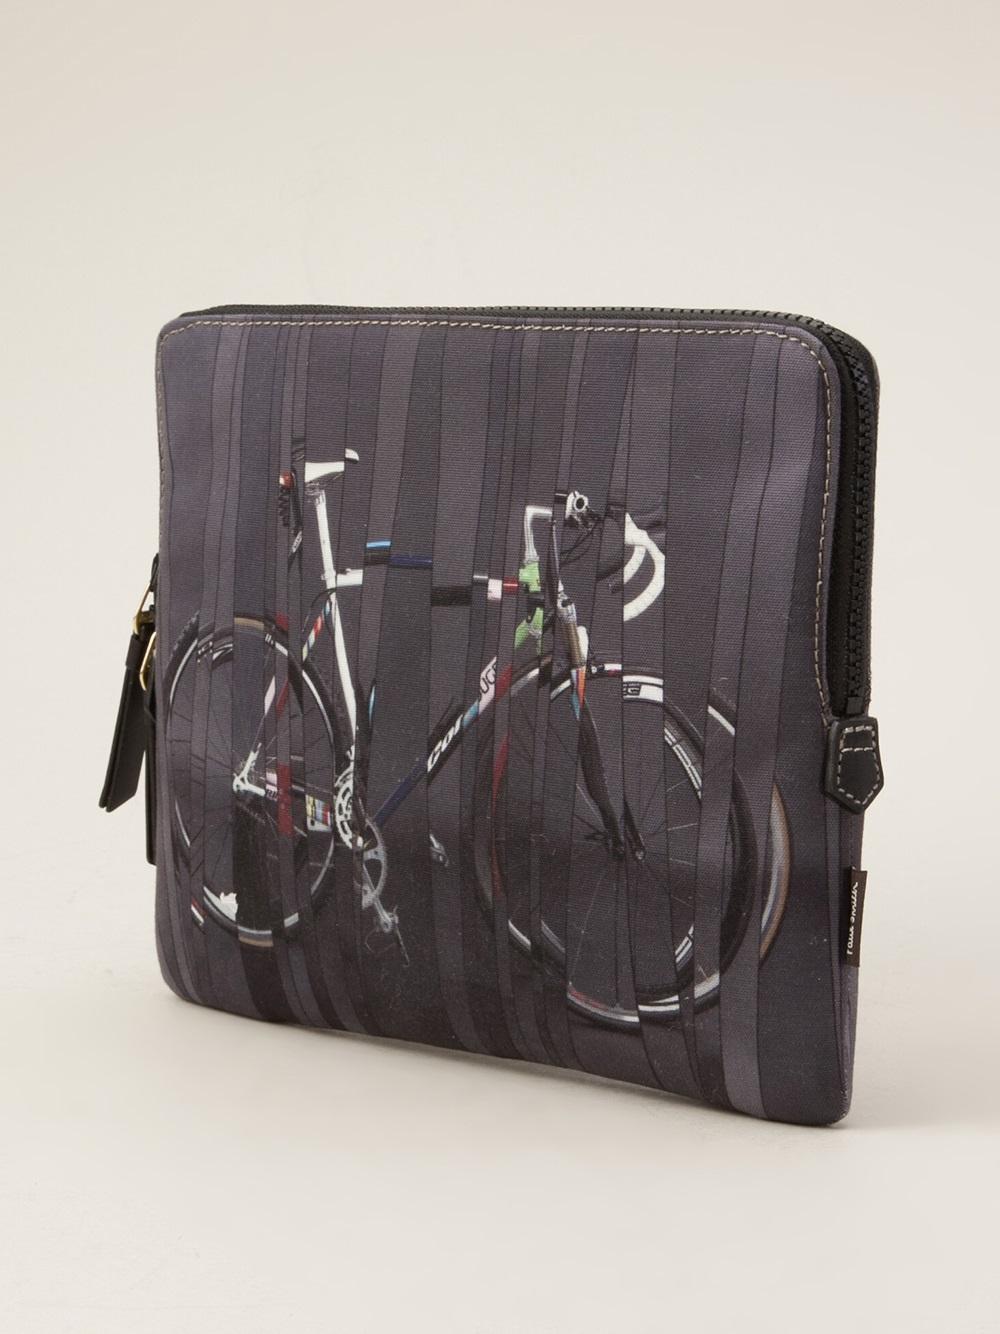 710898b575 Lyst - Paul Smith 9 Bikes Ipad Case in Gray